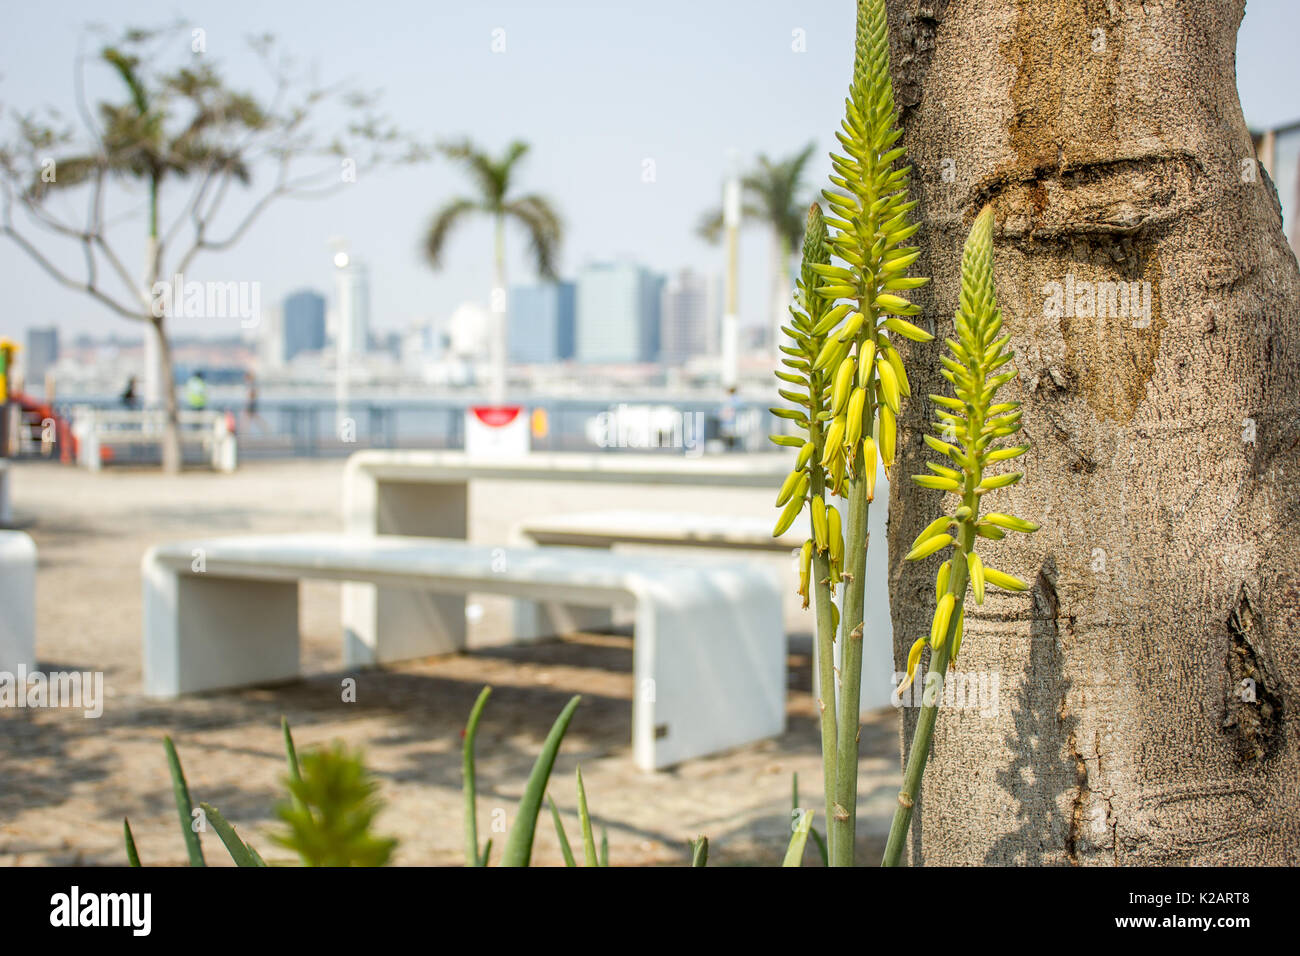 Other View of Luanda City Stock Photo